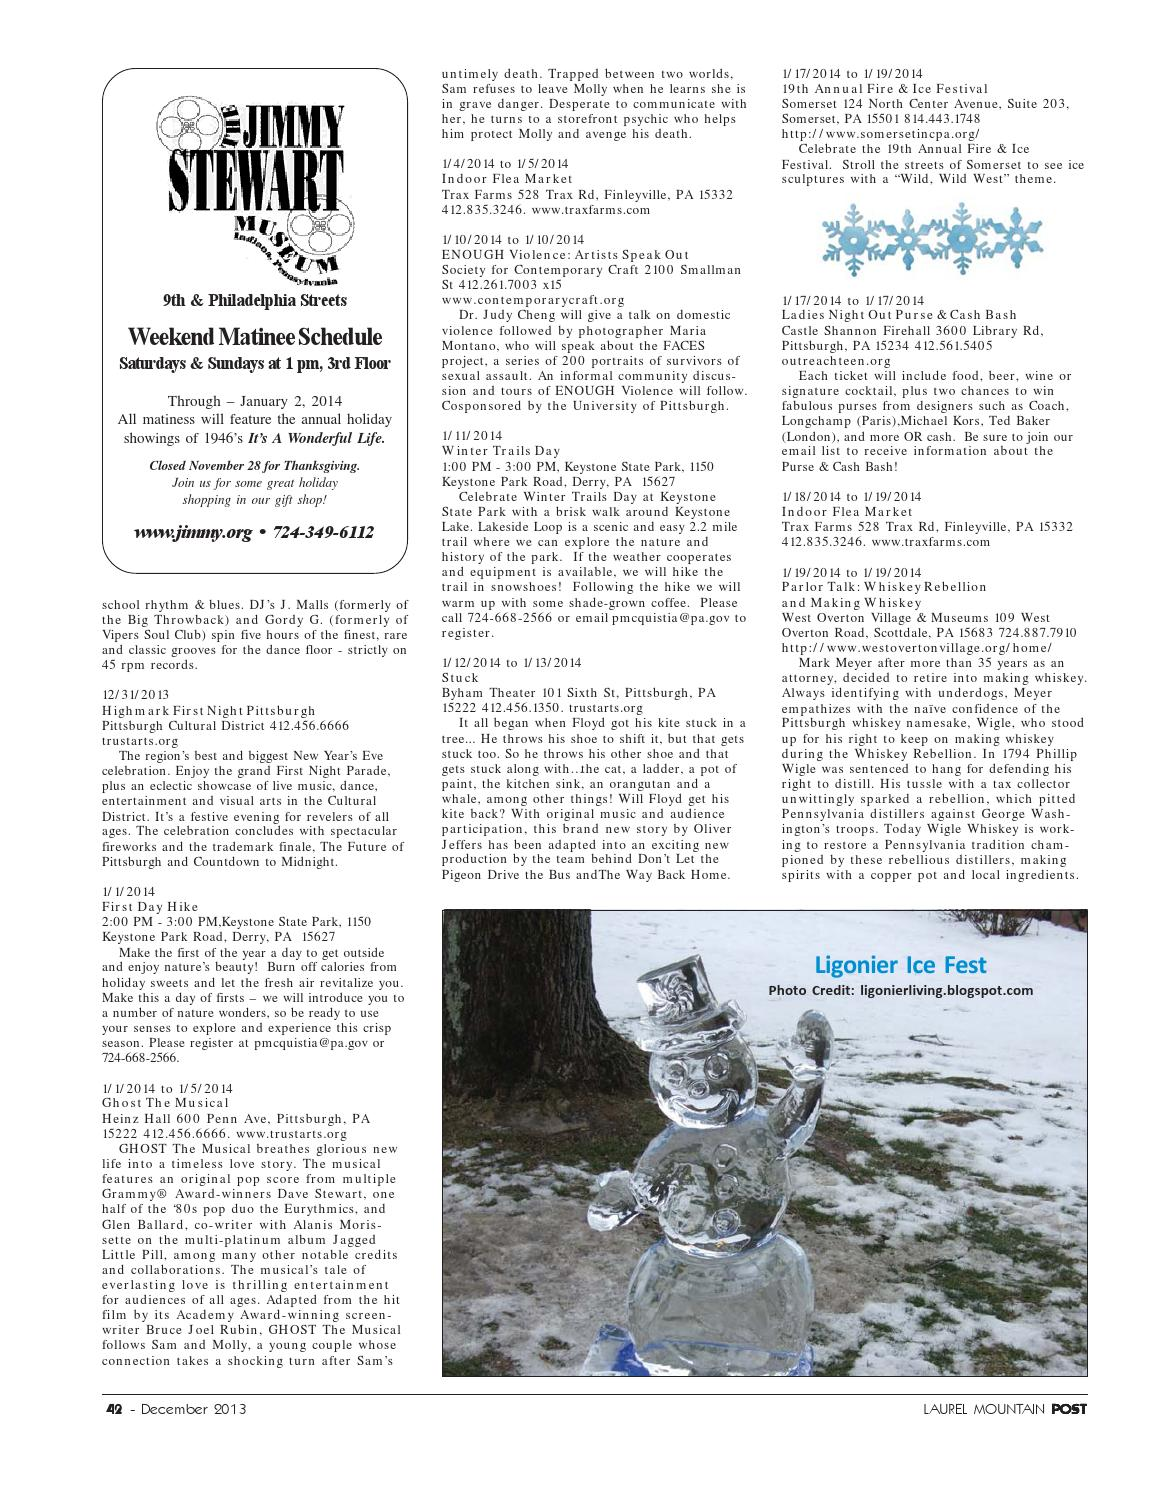 Laurel Mountain Post December 2013 by Laurel Mountain Post - issuu